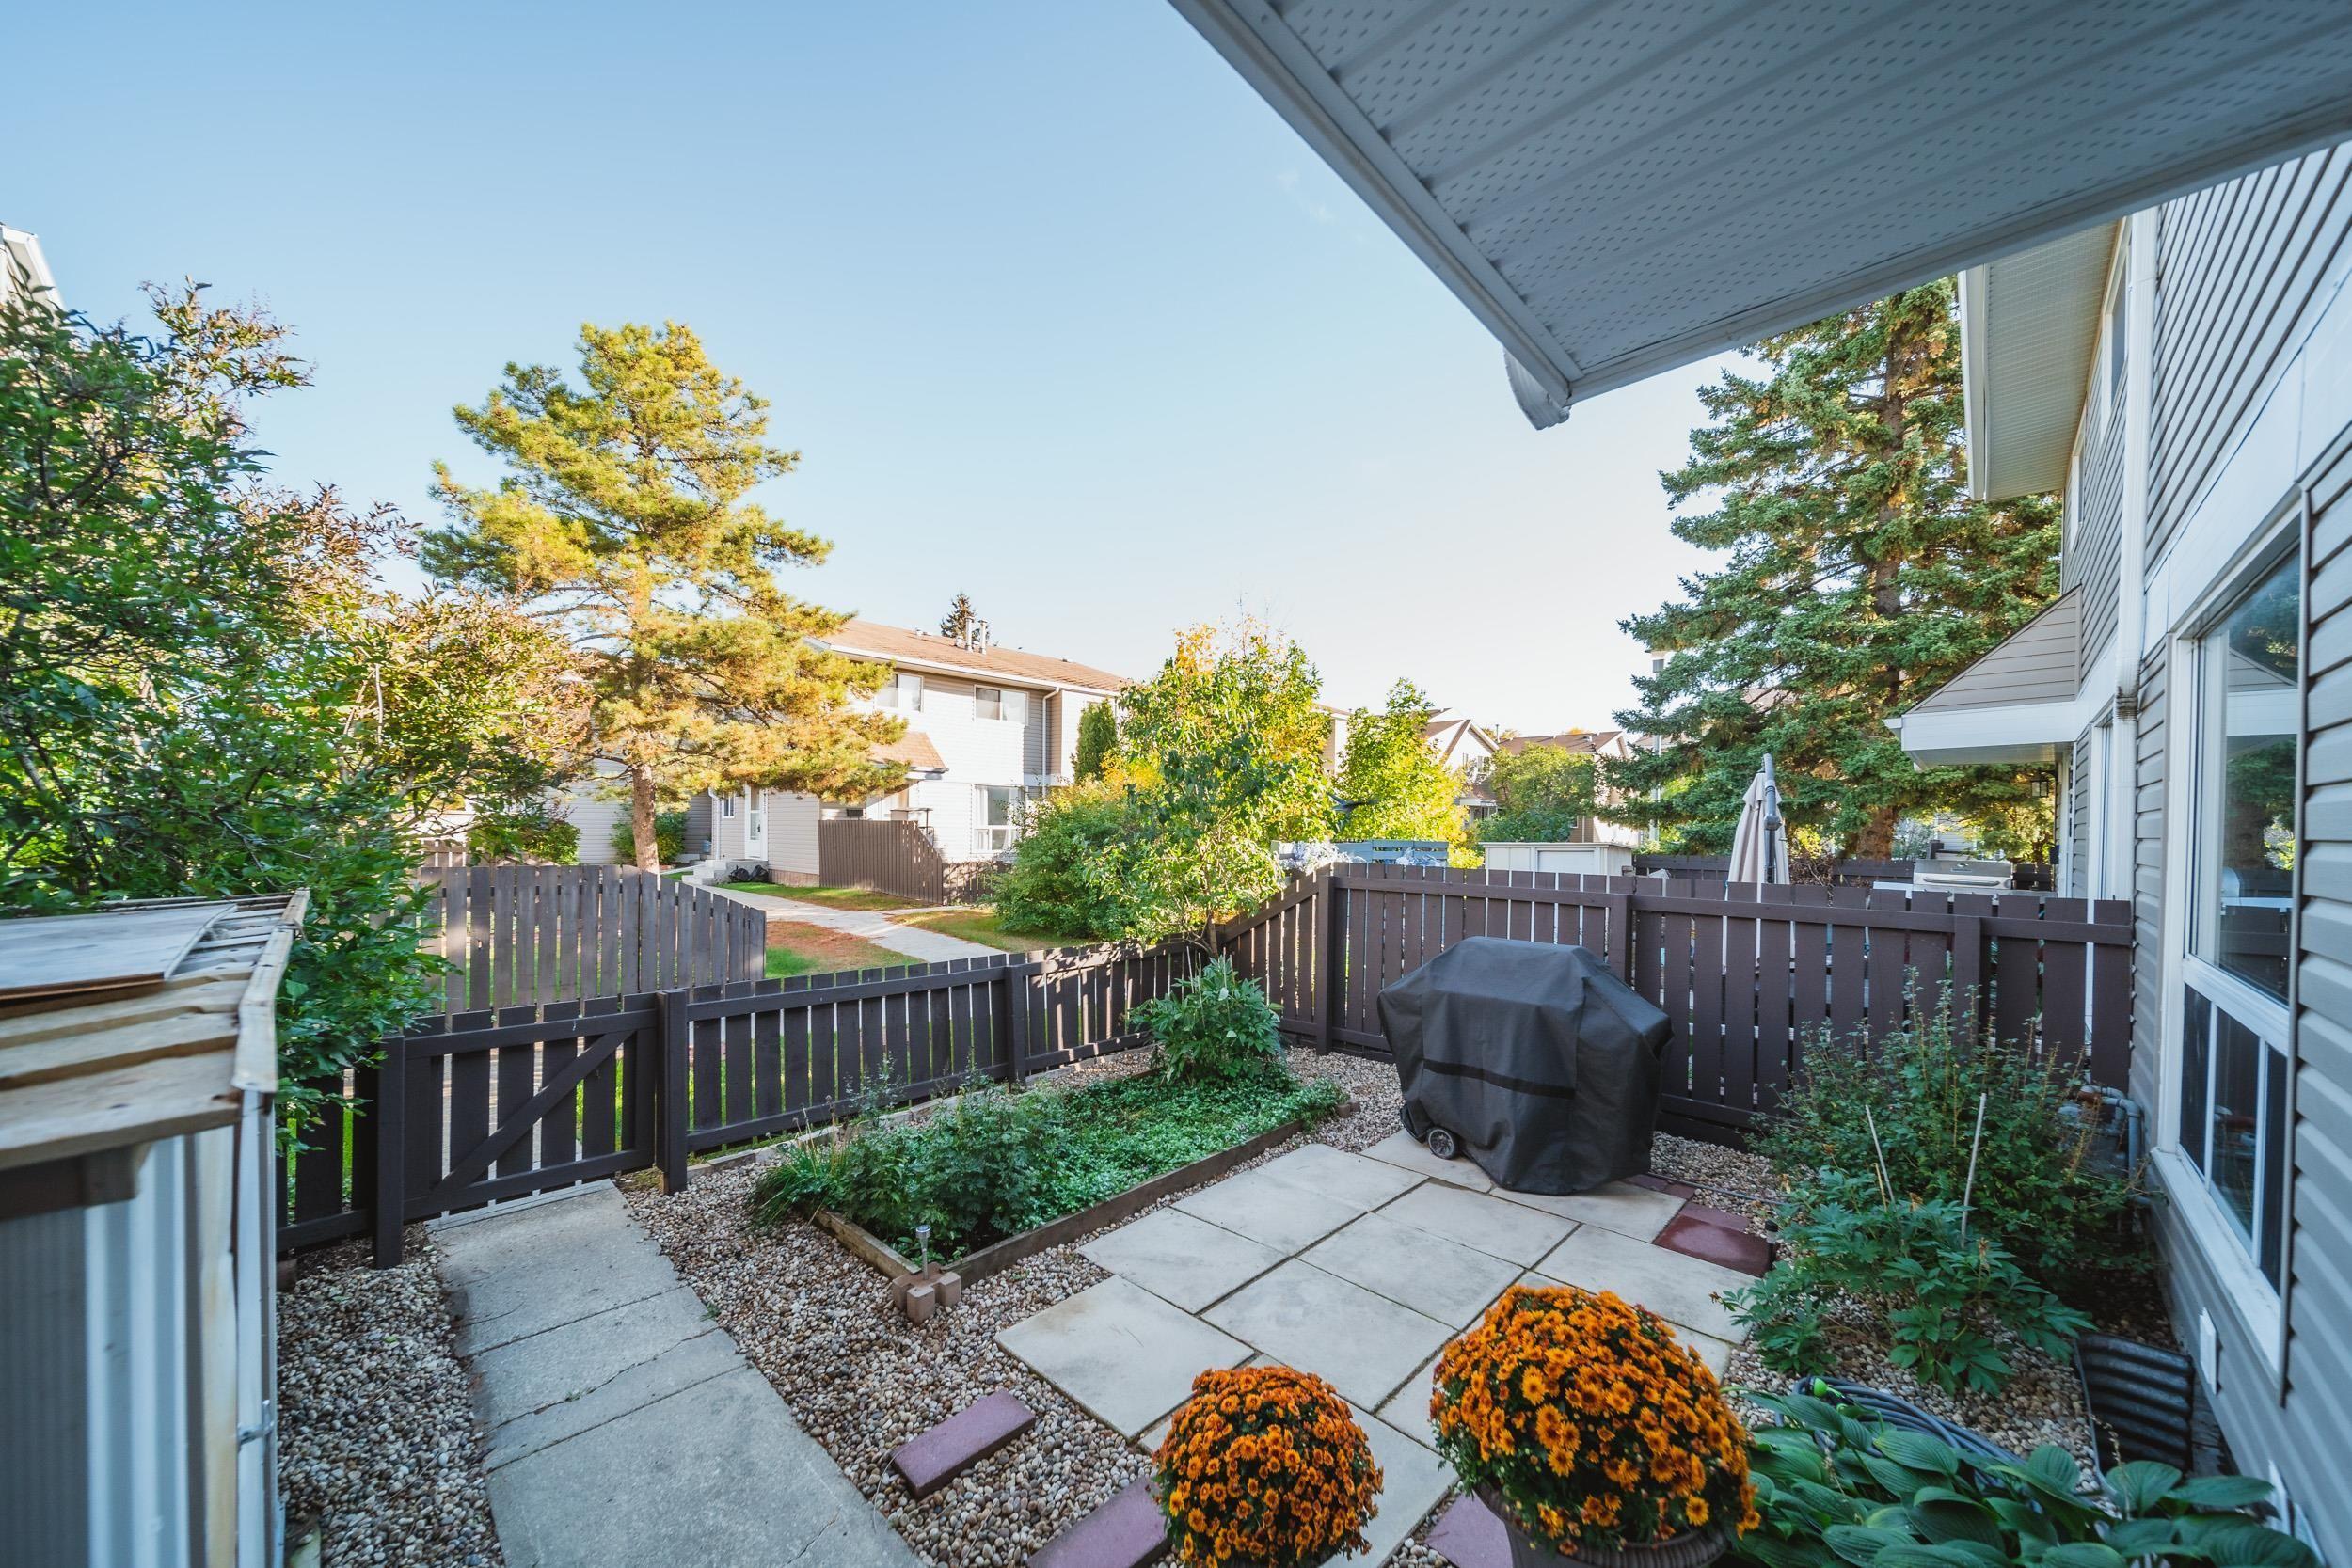 Main Photo: 15105 54 Street in Edmonton: Zone 02 Townhouse for sale : MLS®# E4264323